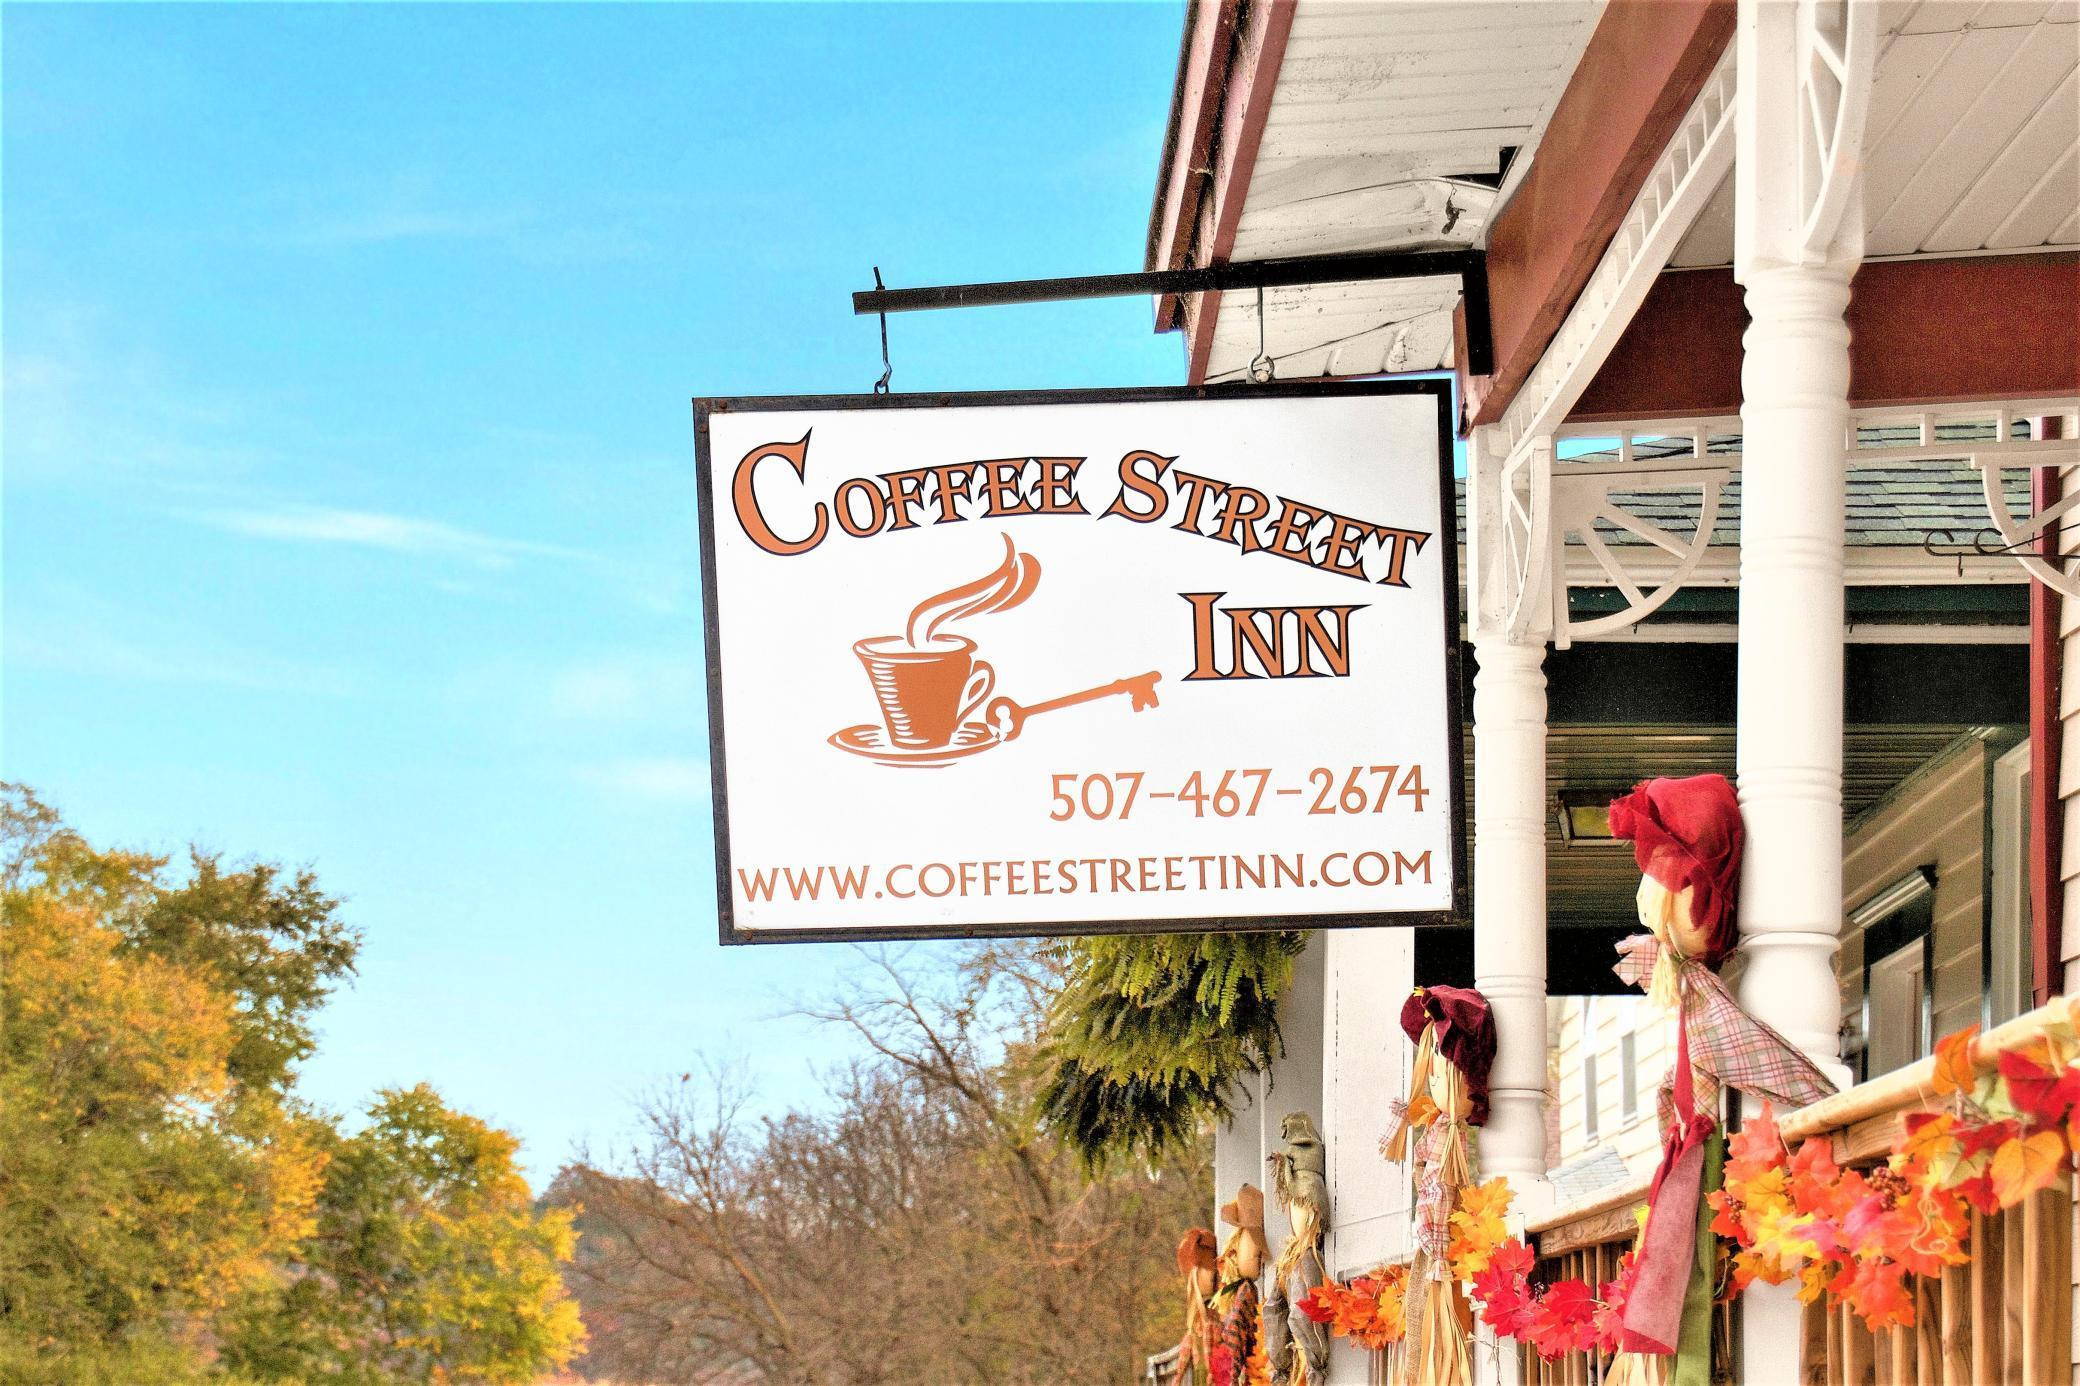 305 Coffee Street, Lanesboro, MN 55949